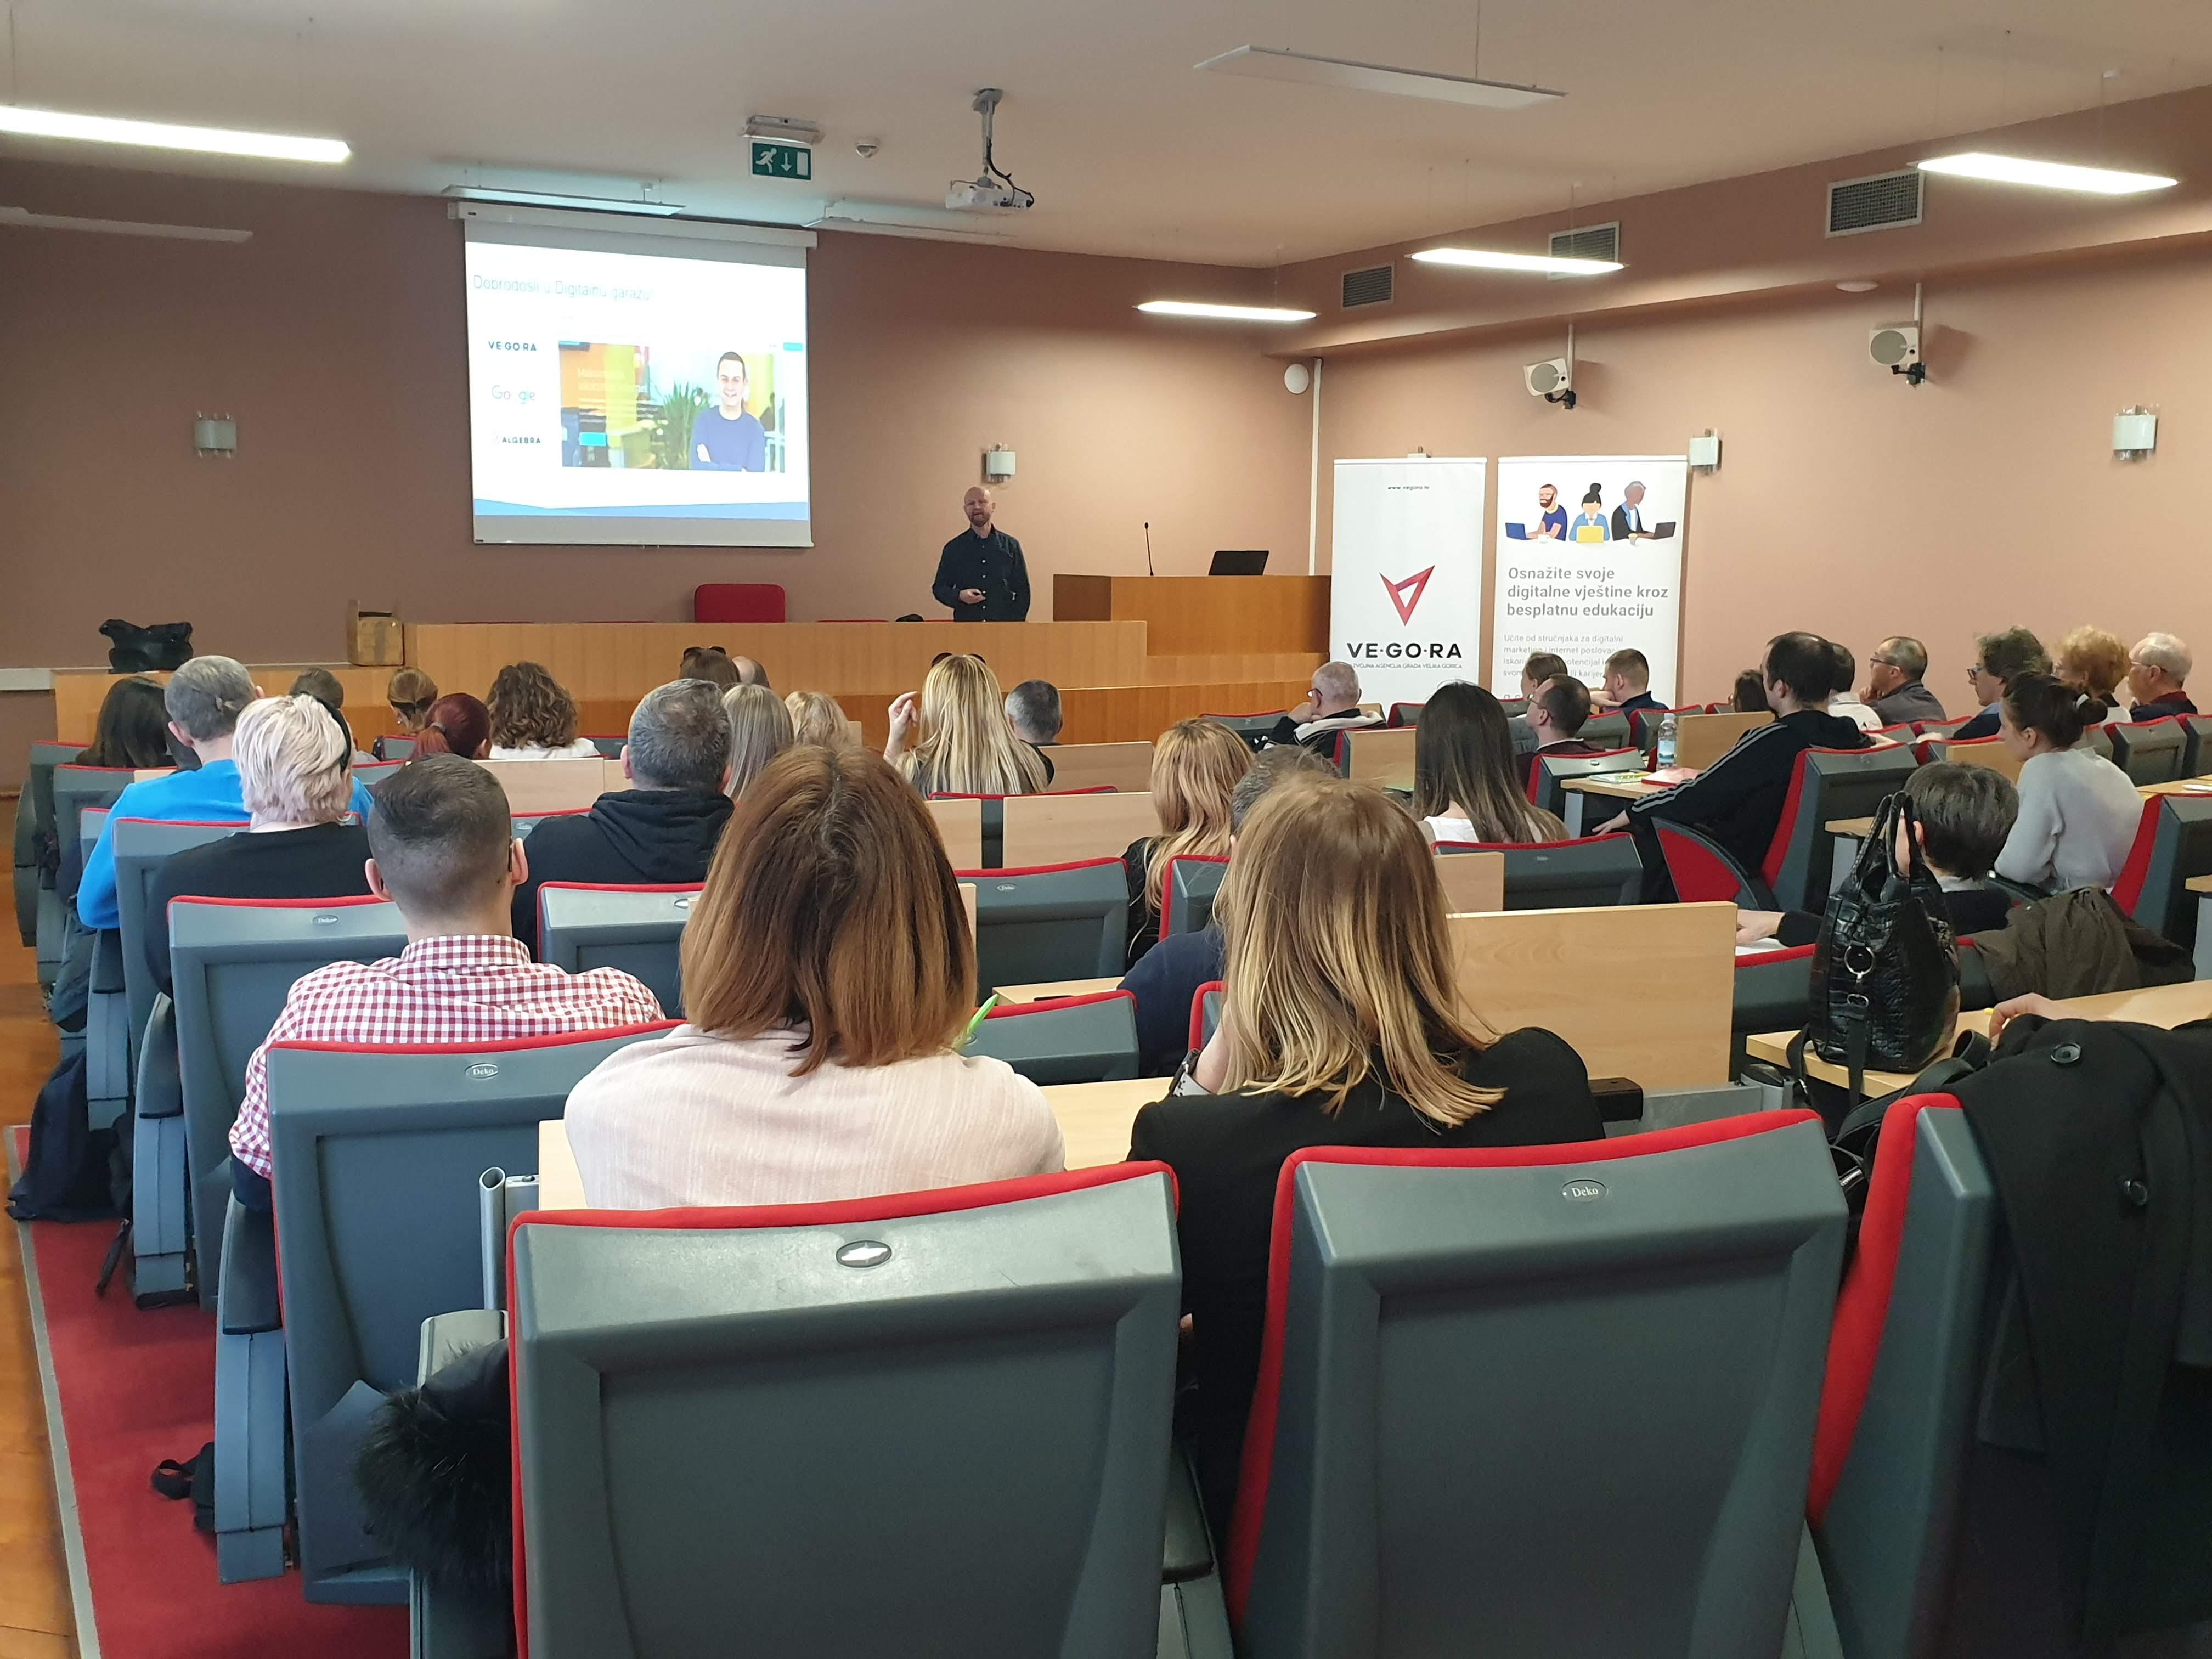 Agencija Vegora - Digitalne radionice - Velika Gorica